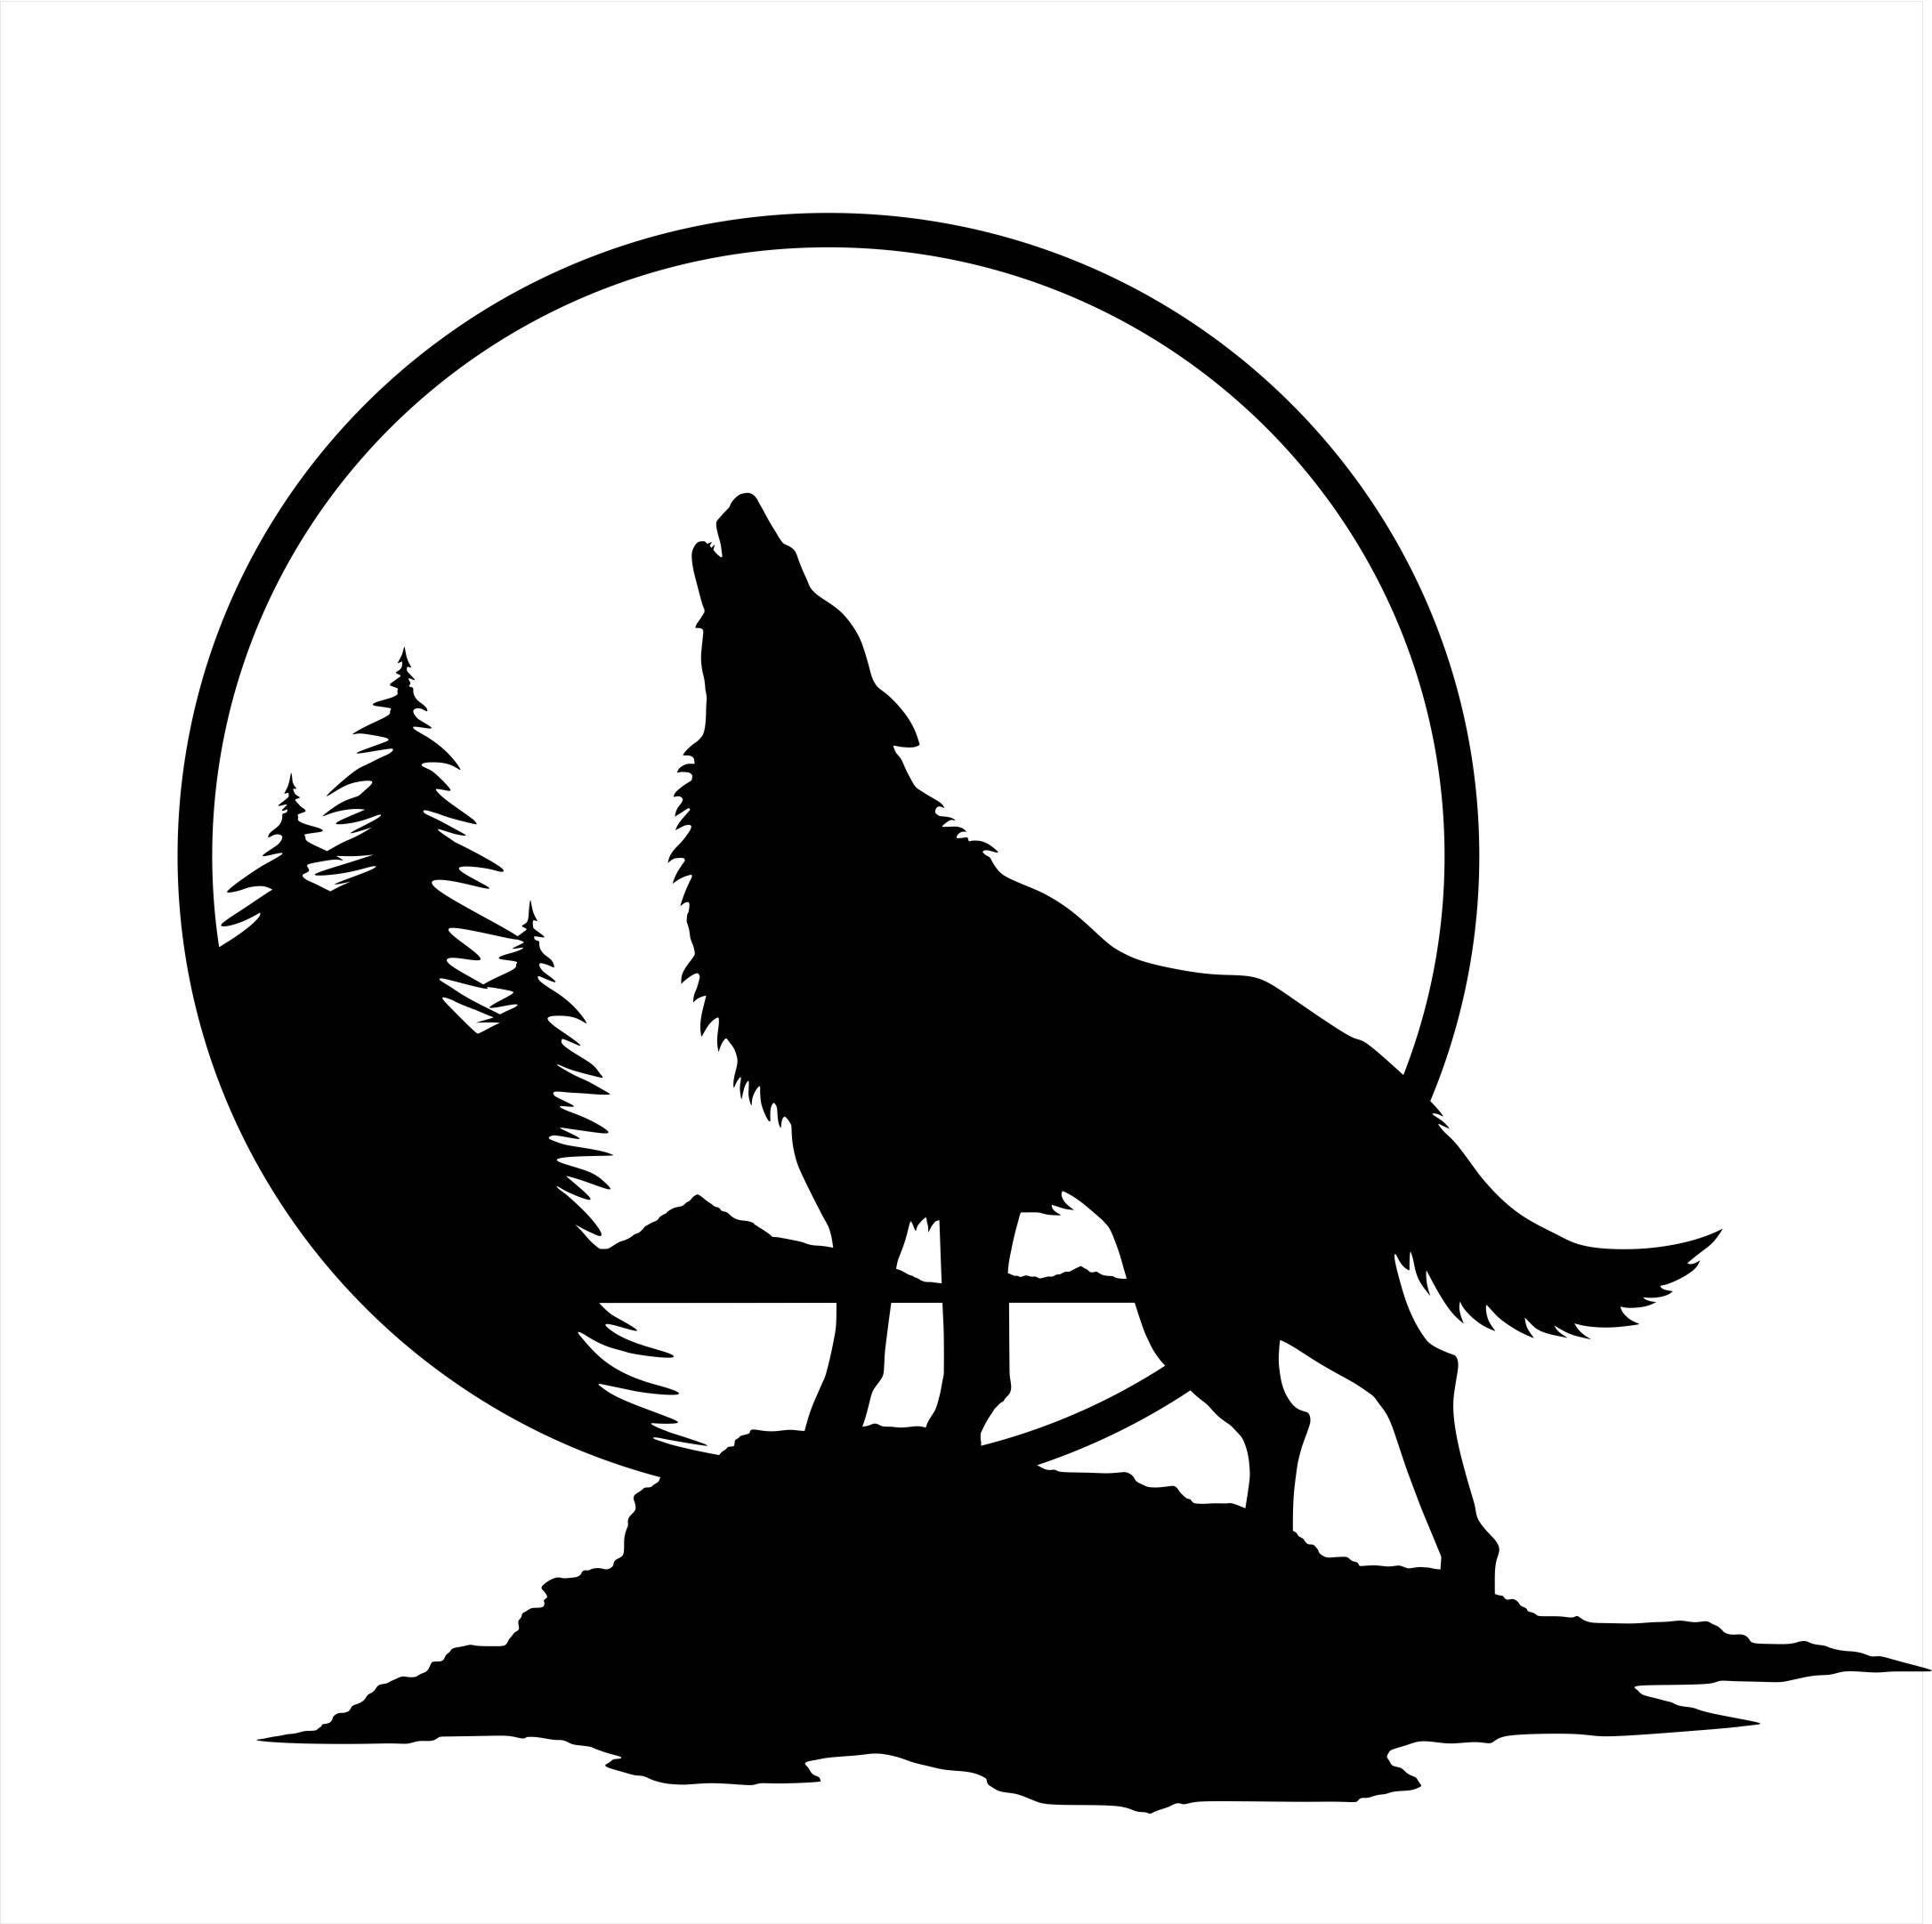 Https Www Google Com Search Q Silhouette Of Wolf Howling Client Firefox B Ab Tbm Isch Tbo U Source Univ S Wolf Silhouette Wolf Howling At Moon Silhouette Art